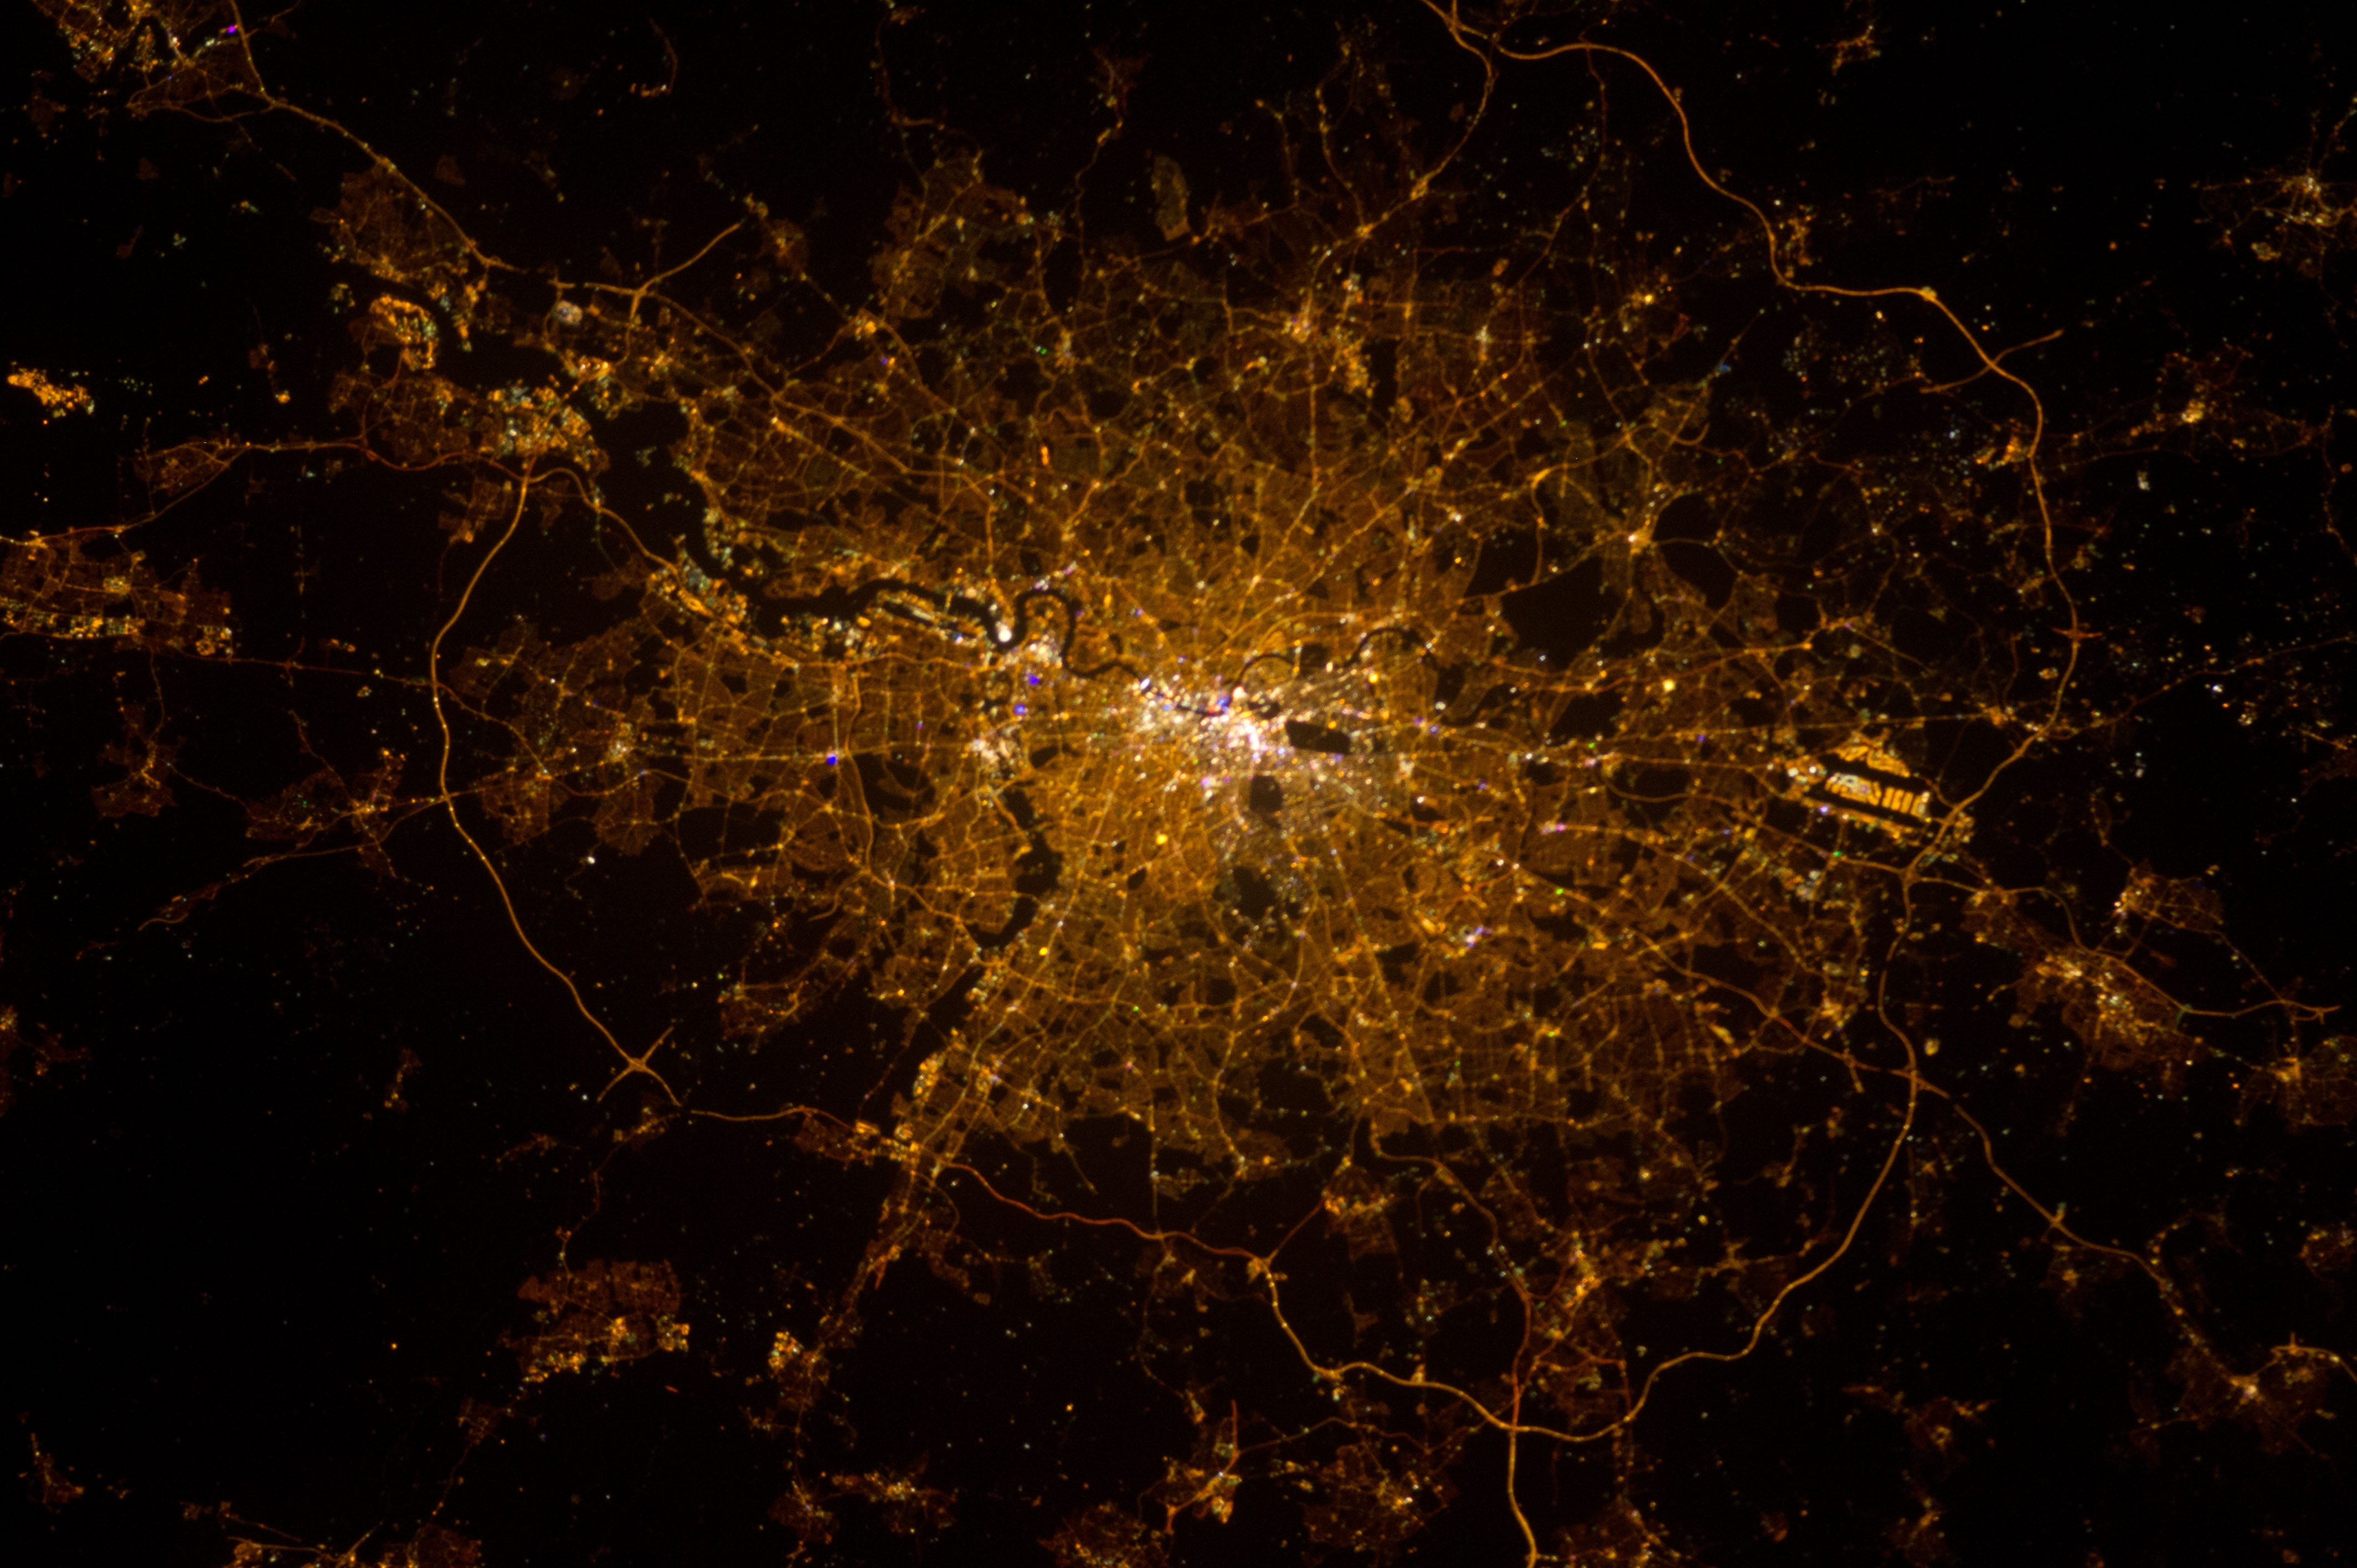 London at Nighttime